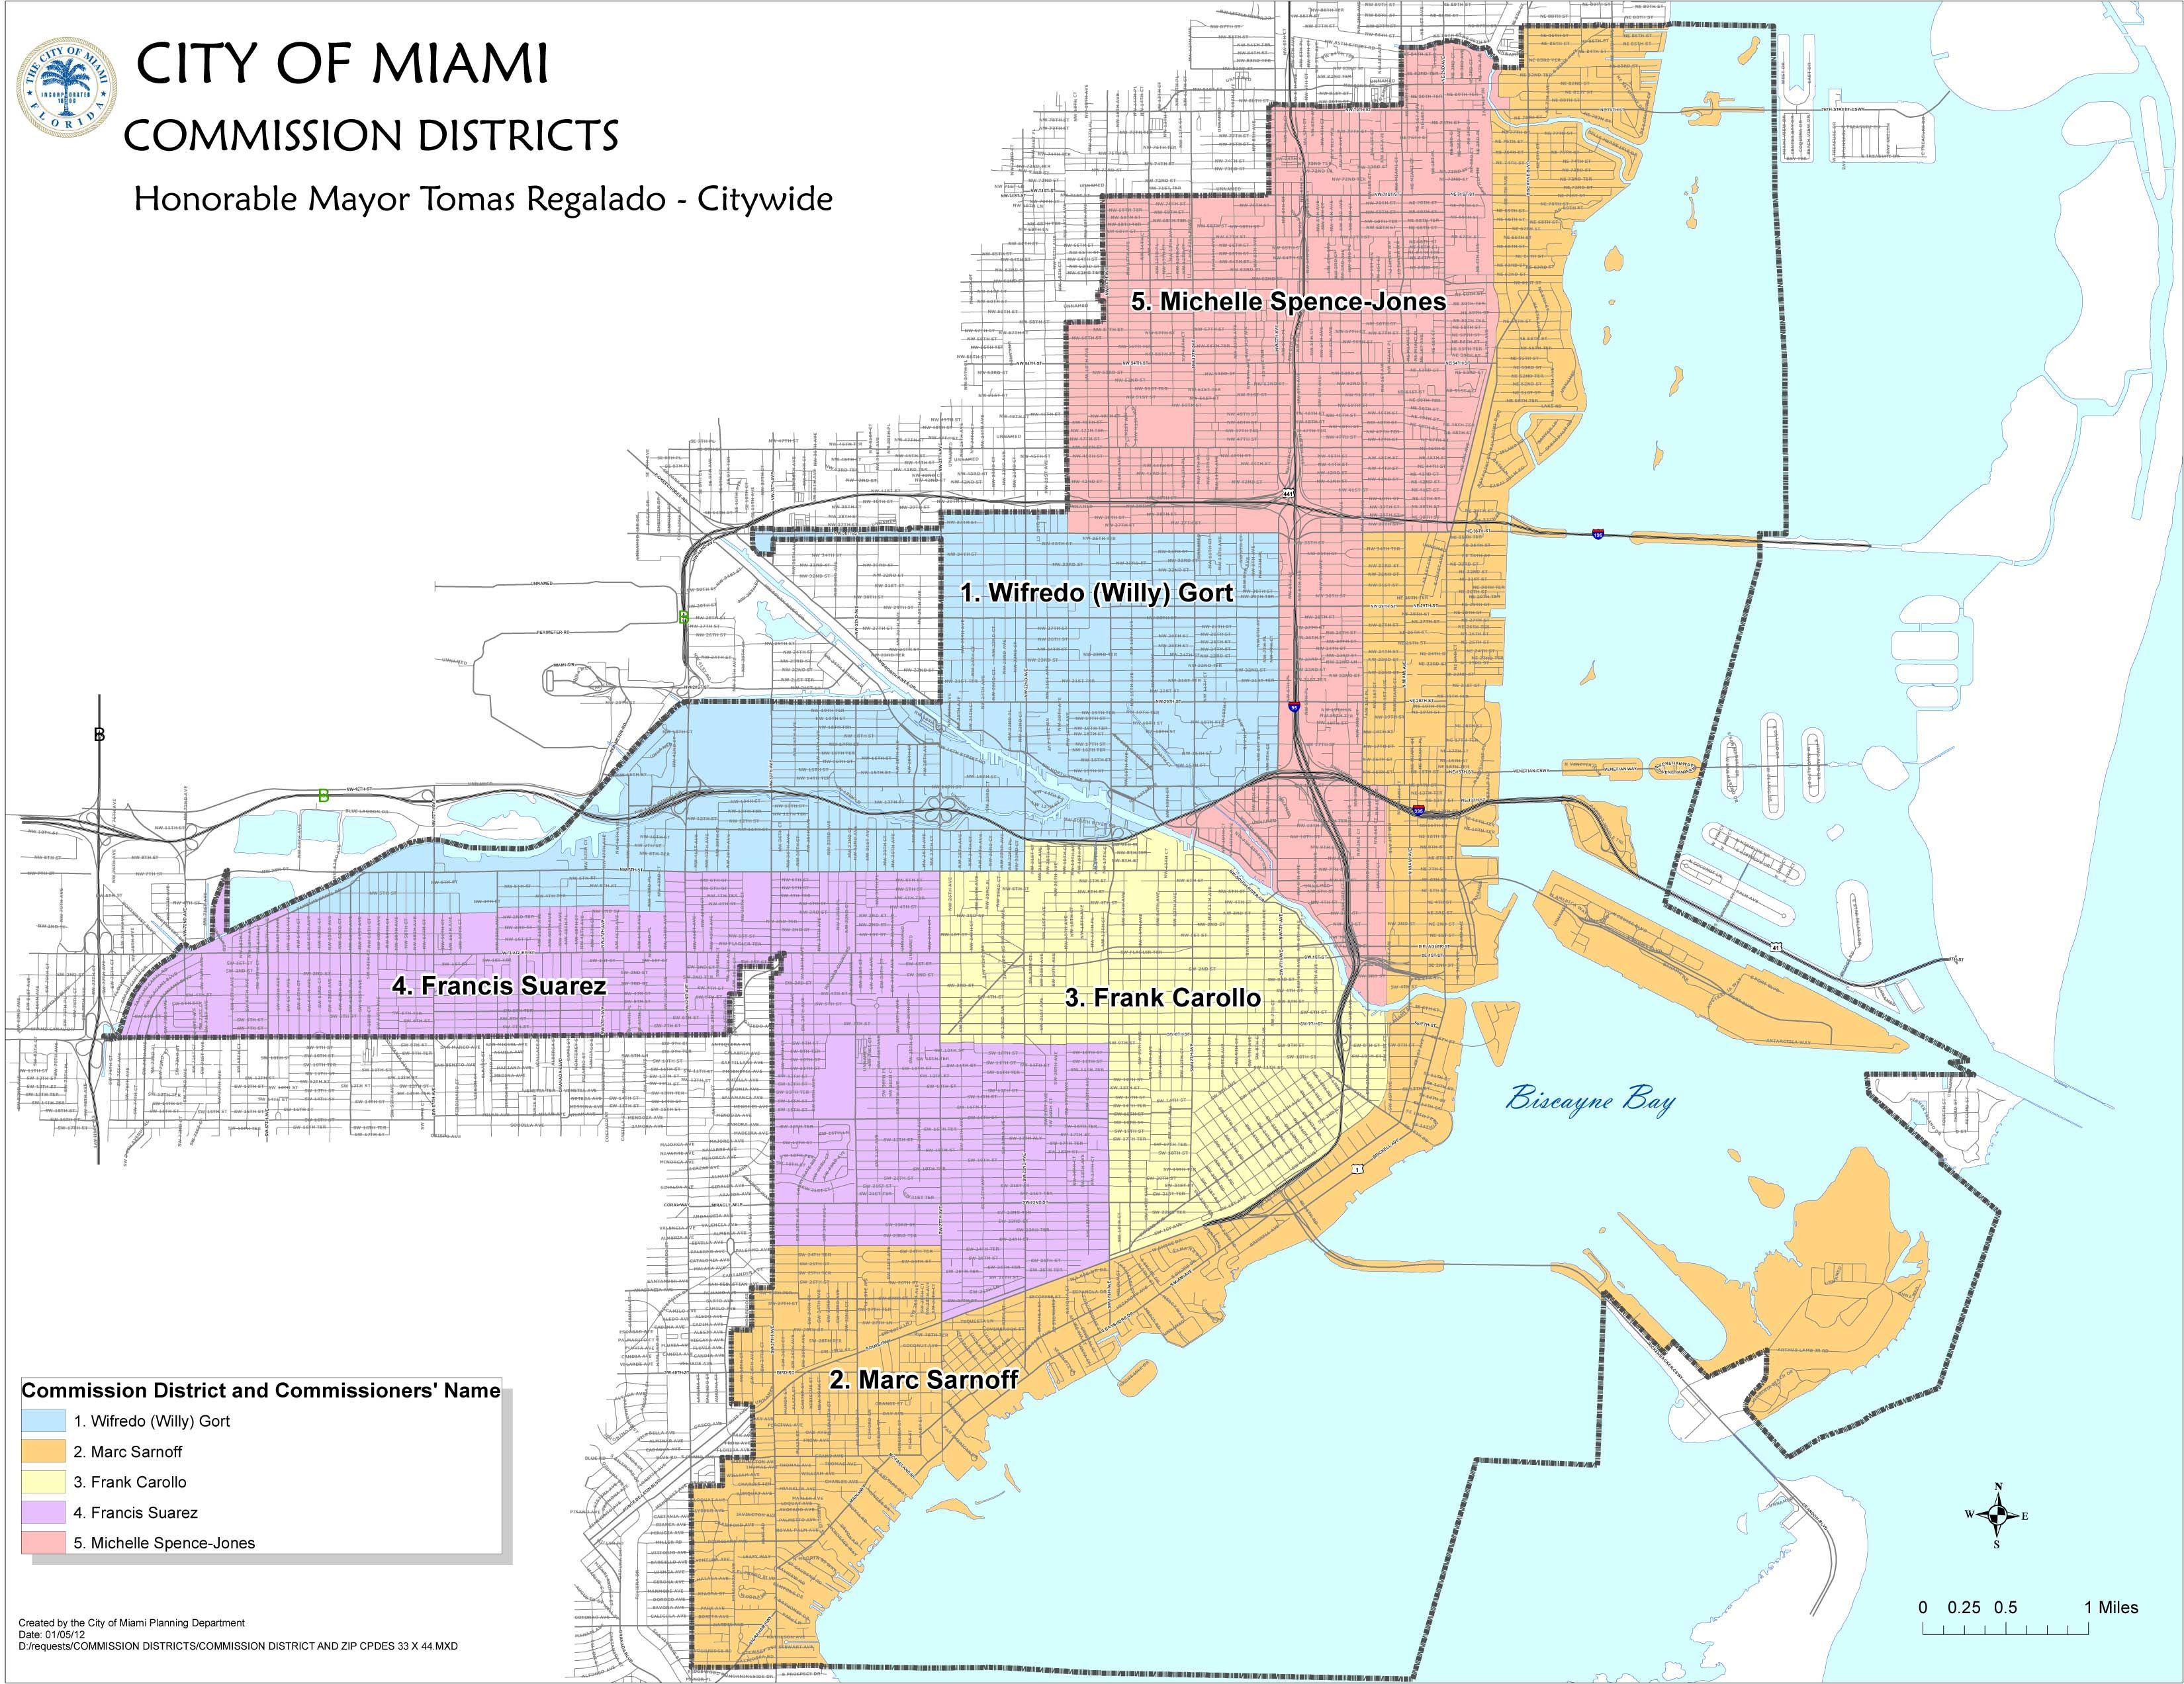 pincam coggburn on miami, florida | city, miami, present day